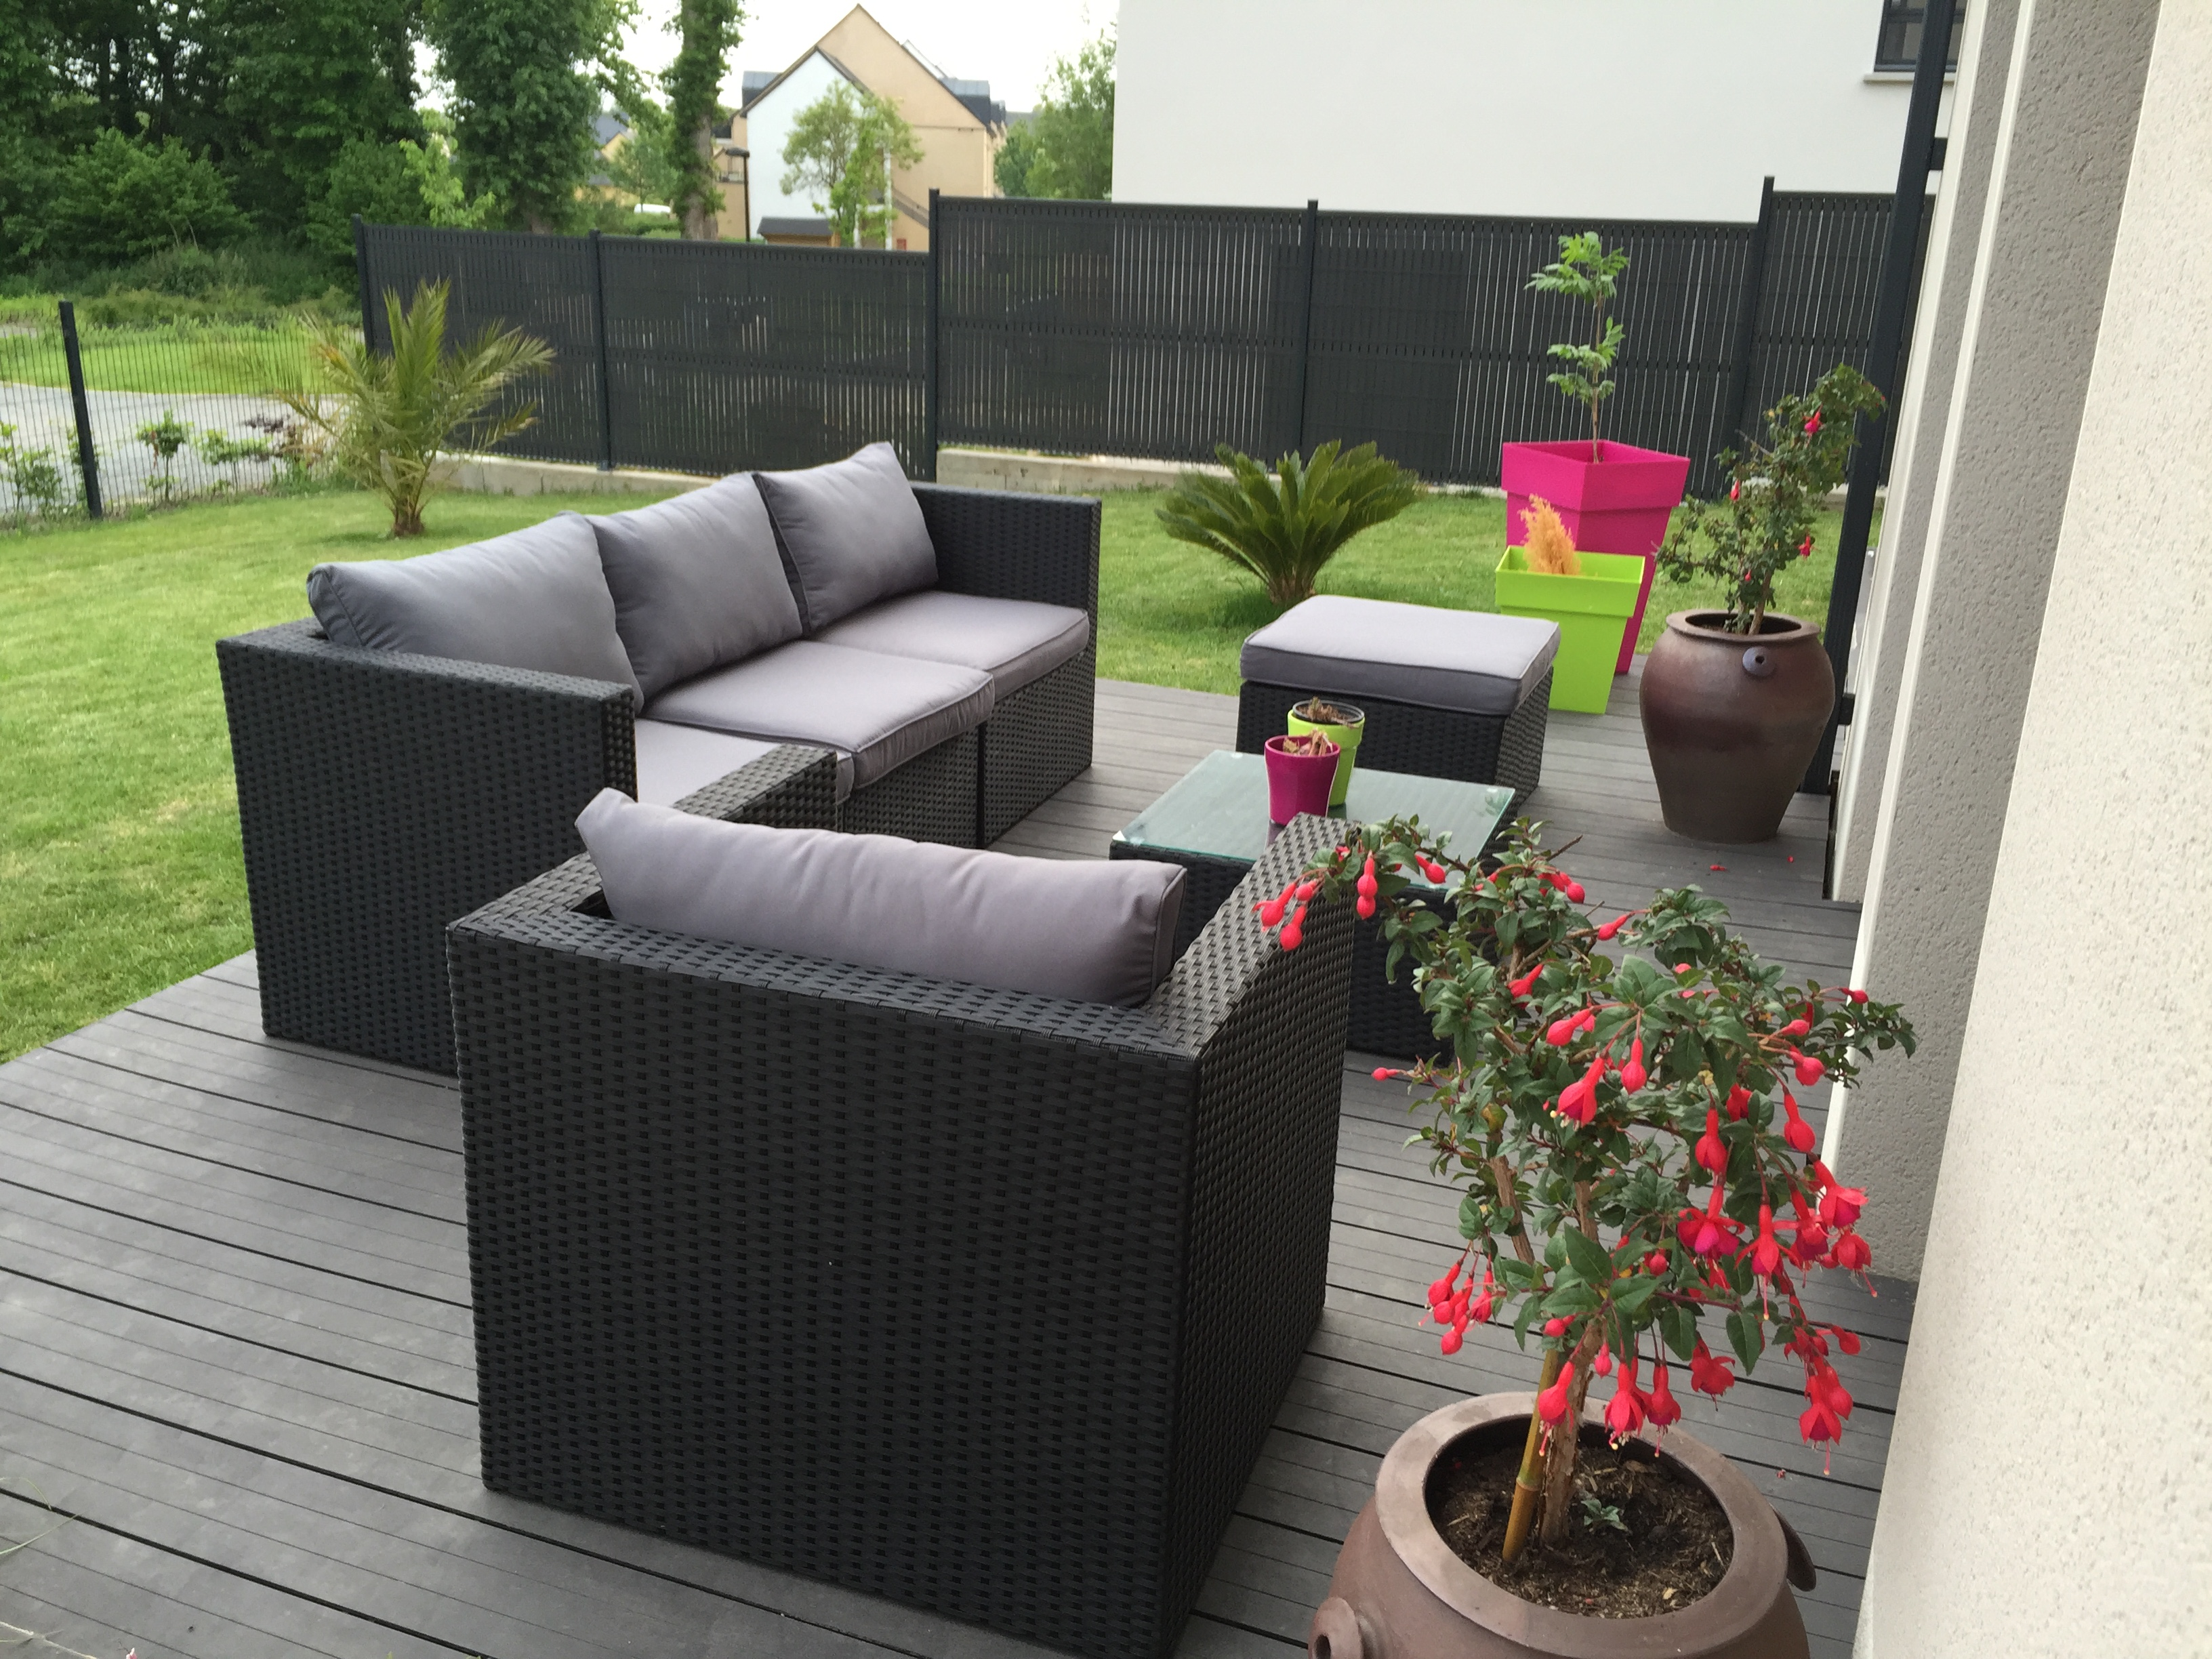 Salon de jardin sortie usine - Mailleraye.fr jardin